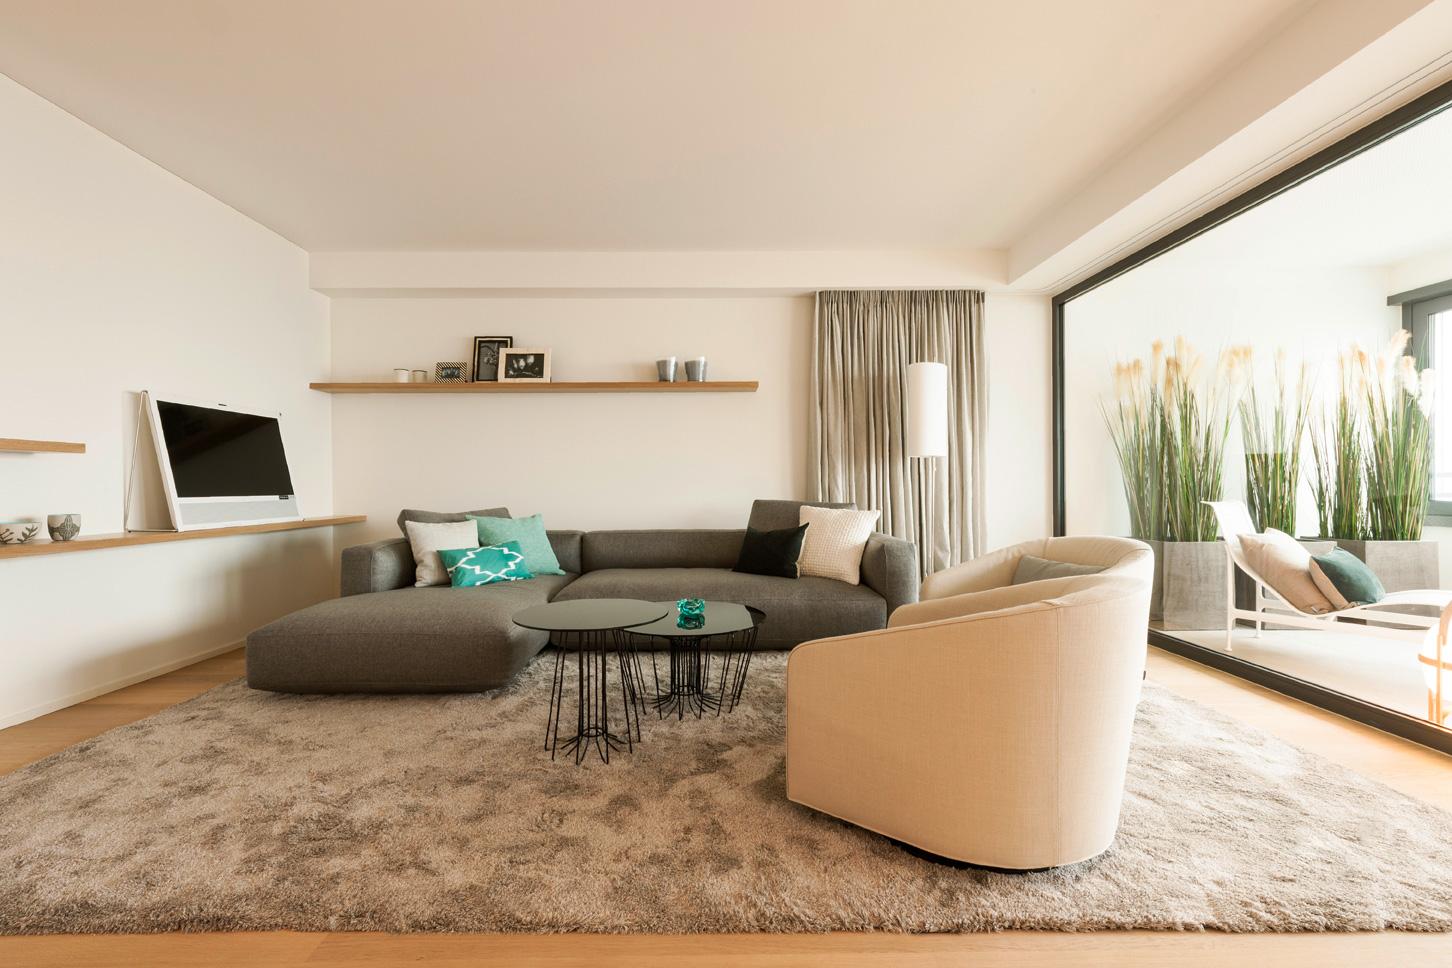 163_iria_degen_interiors_apartment_hardturmpark_zurich1.jpg